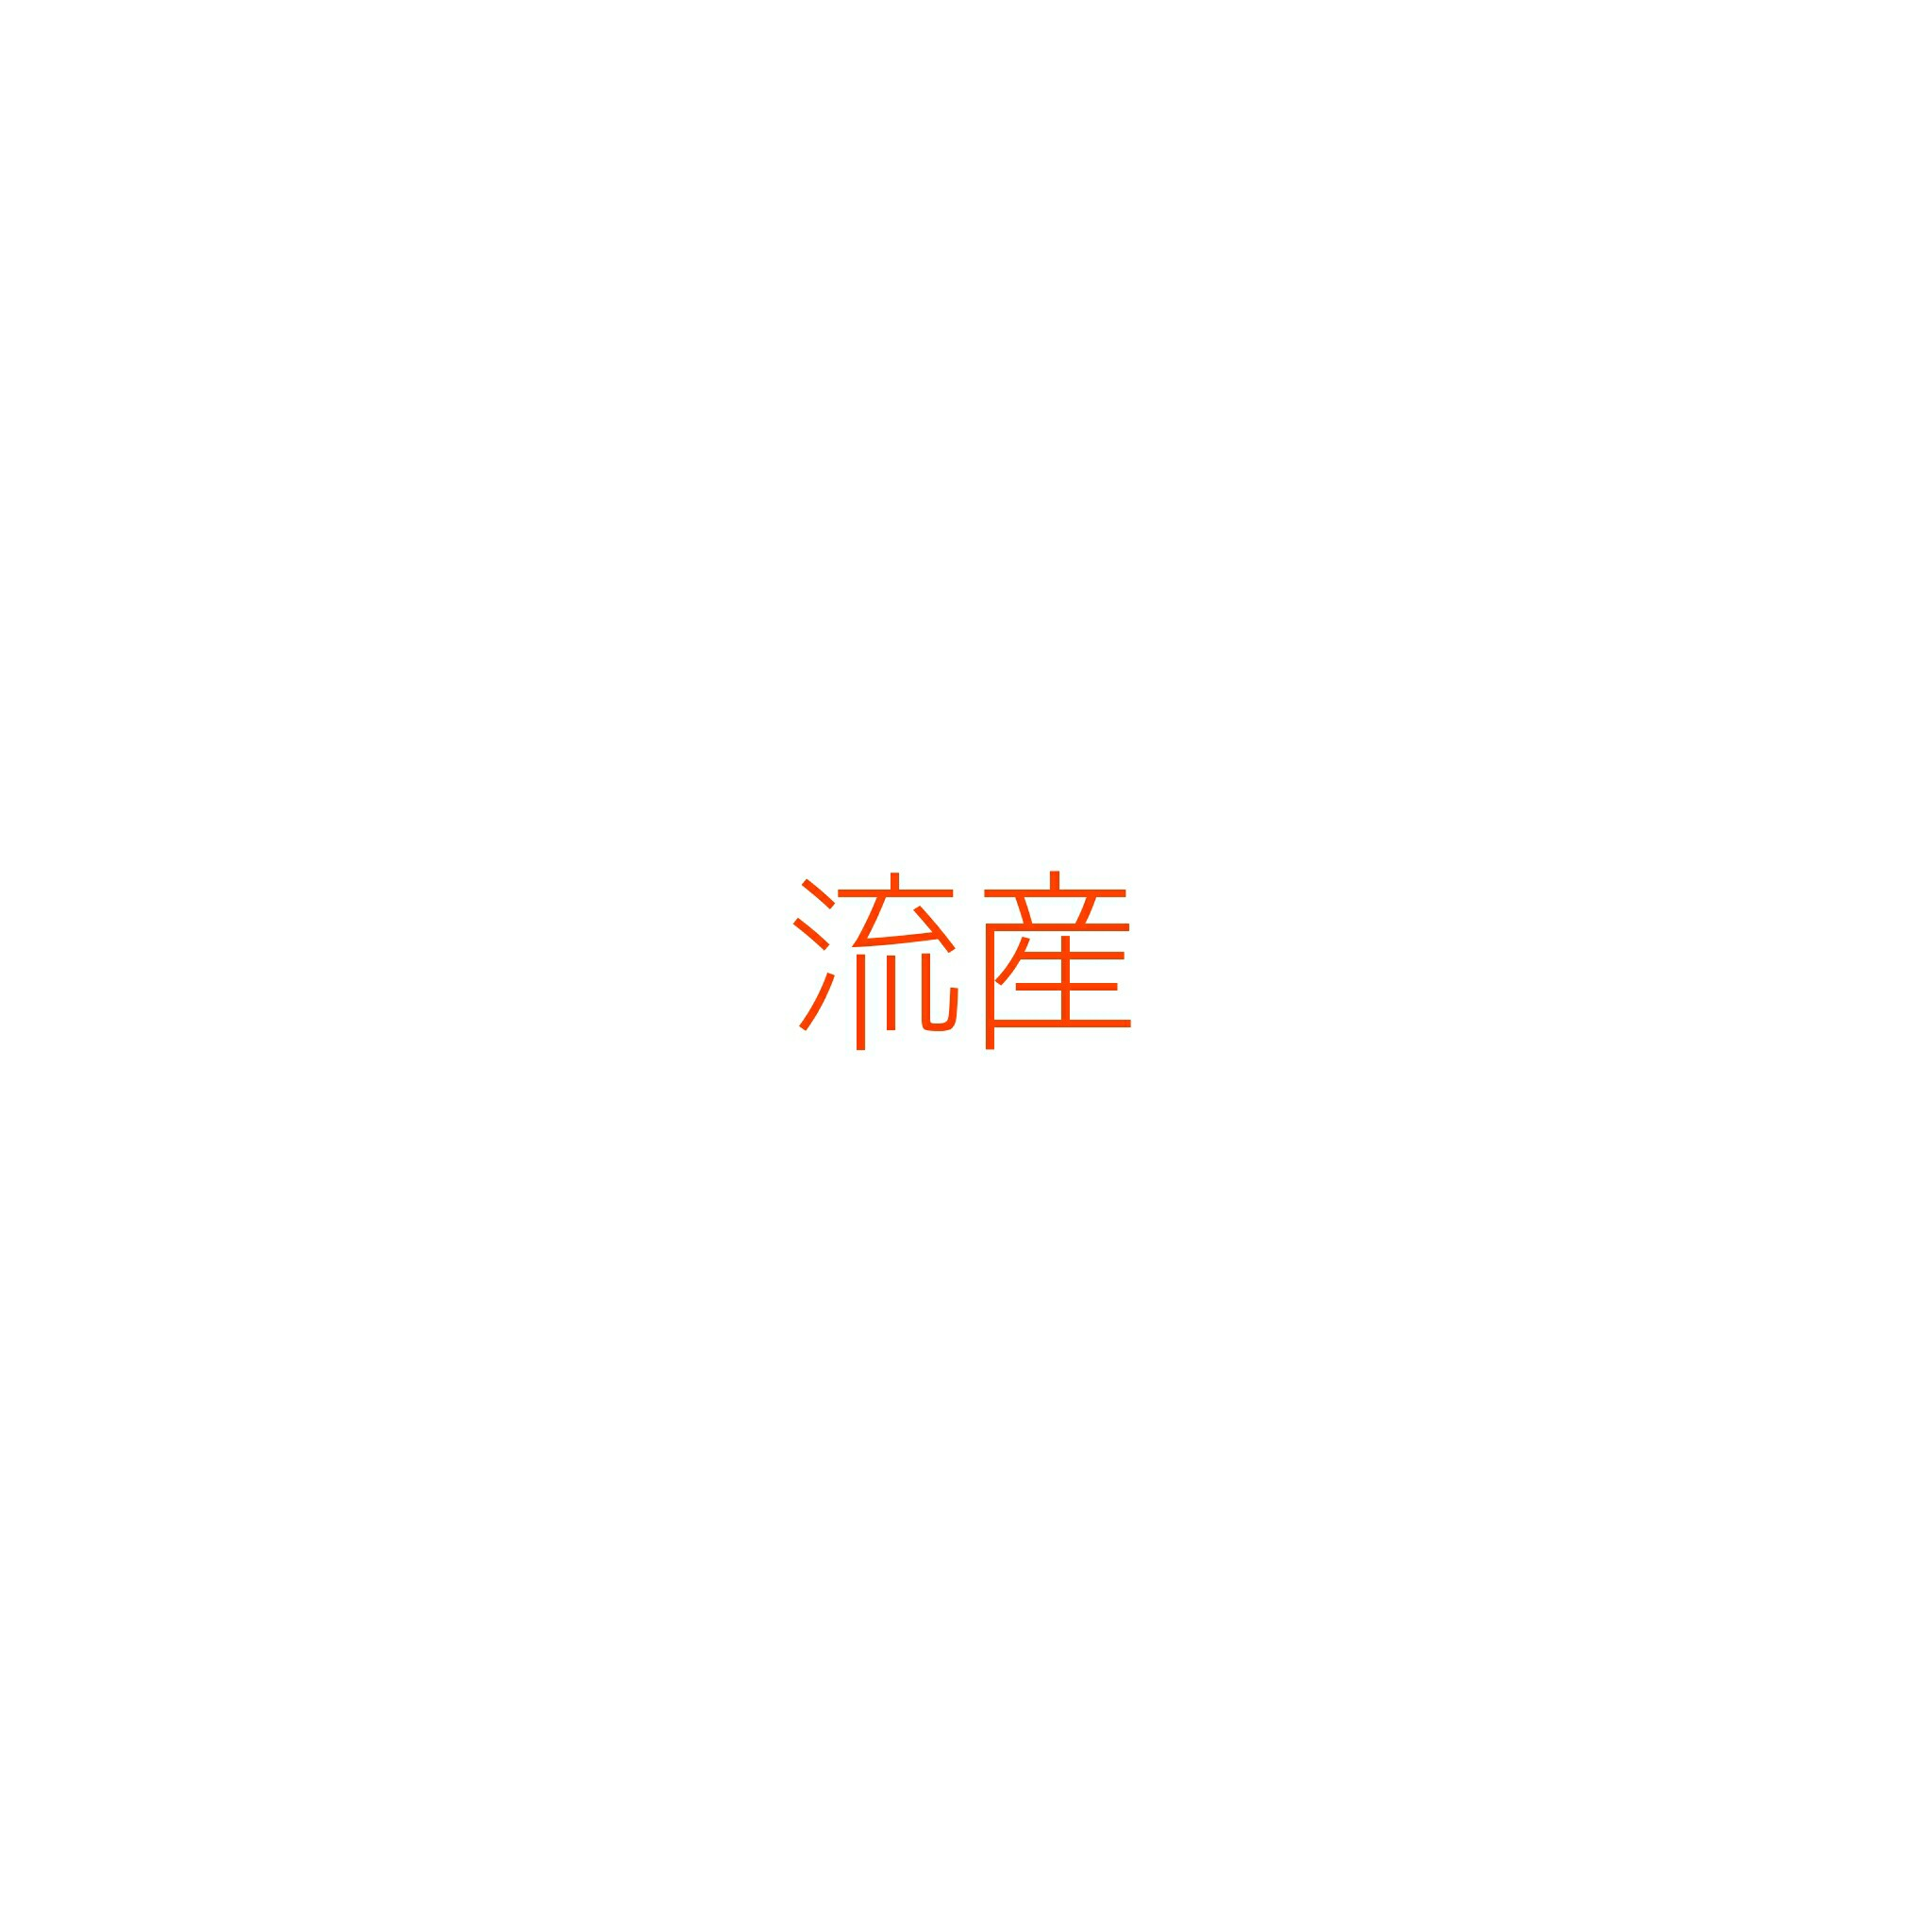 f:id:Sano7:20170722151731j:image